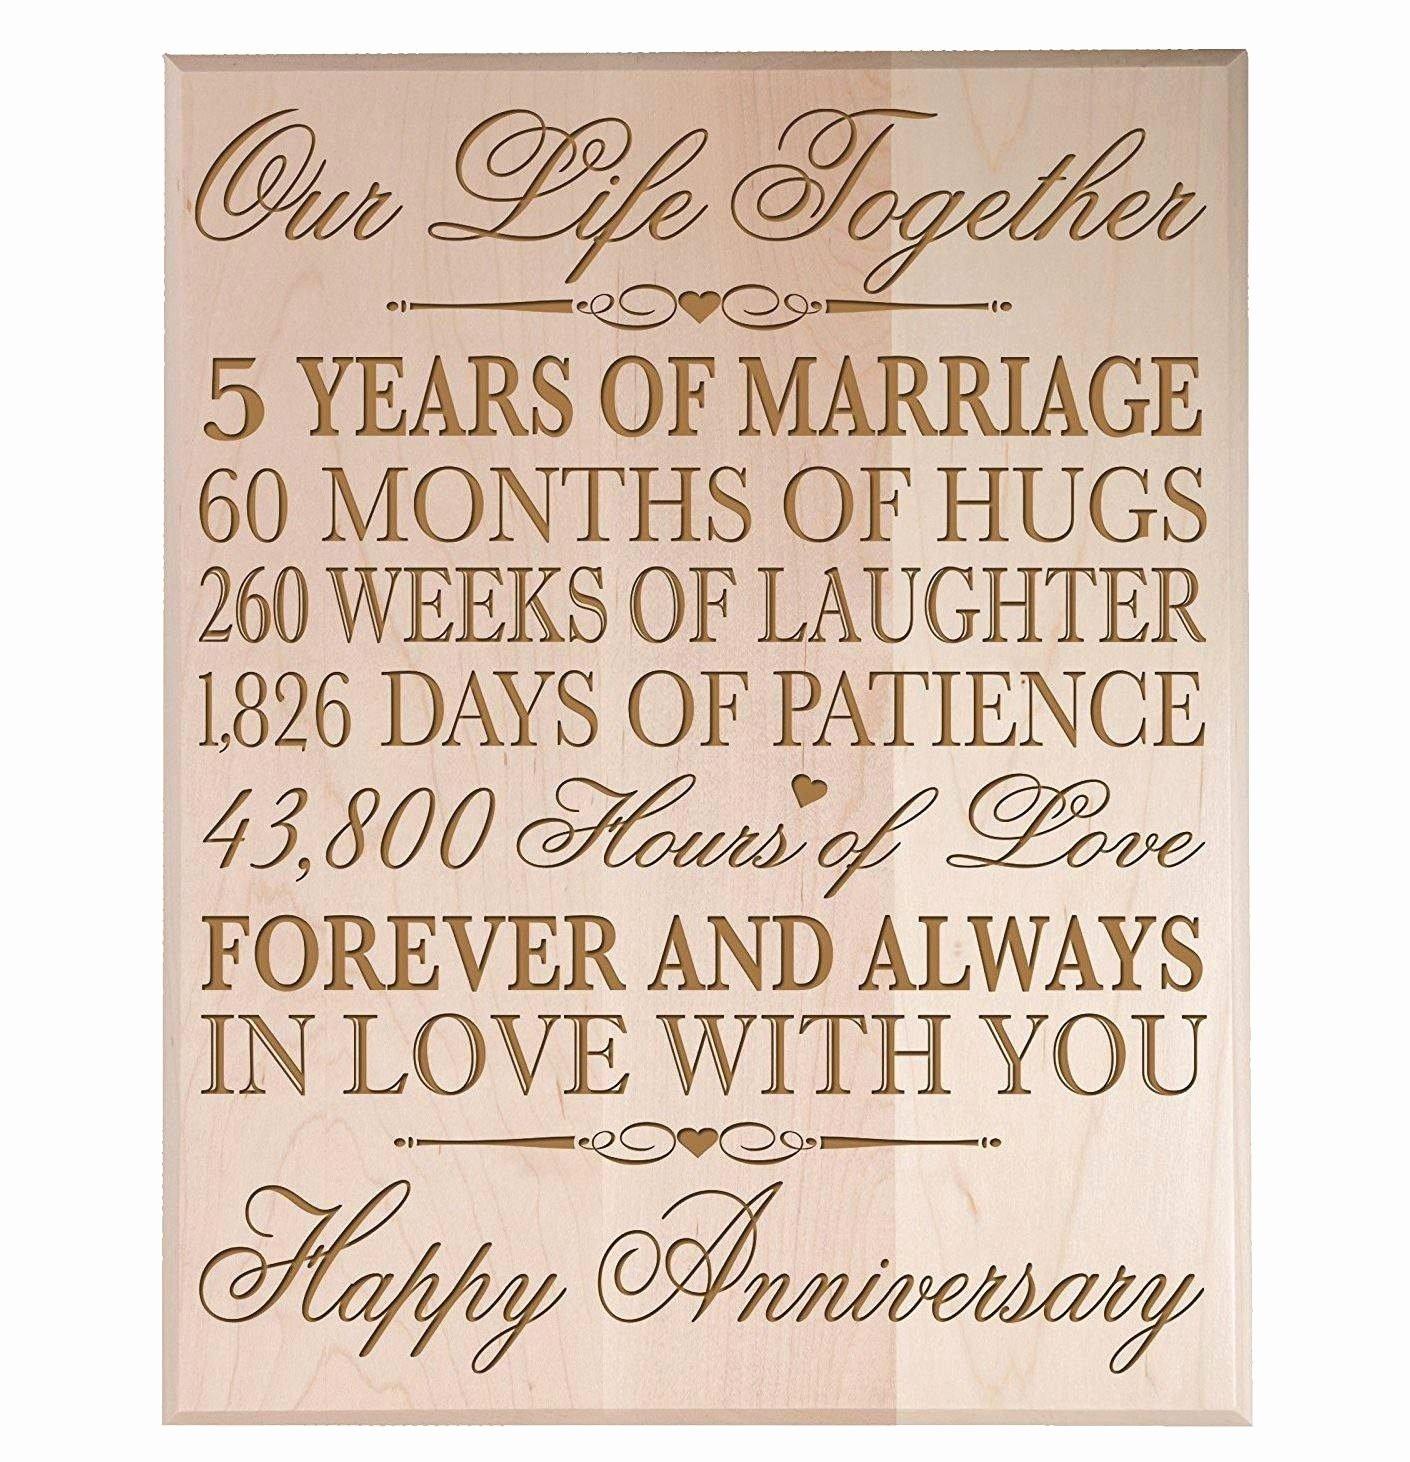 10 Cute 10 Year Wedding Anniversary Ideas 10 year wedding anniversary gift ideas for him elegant top 20 best 2020